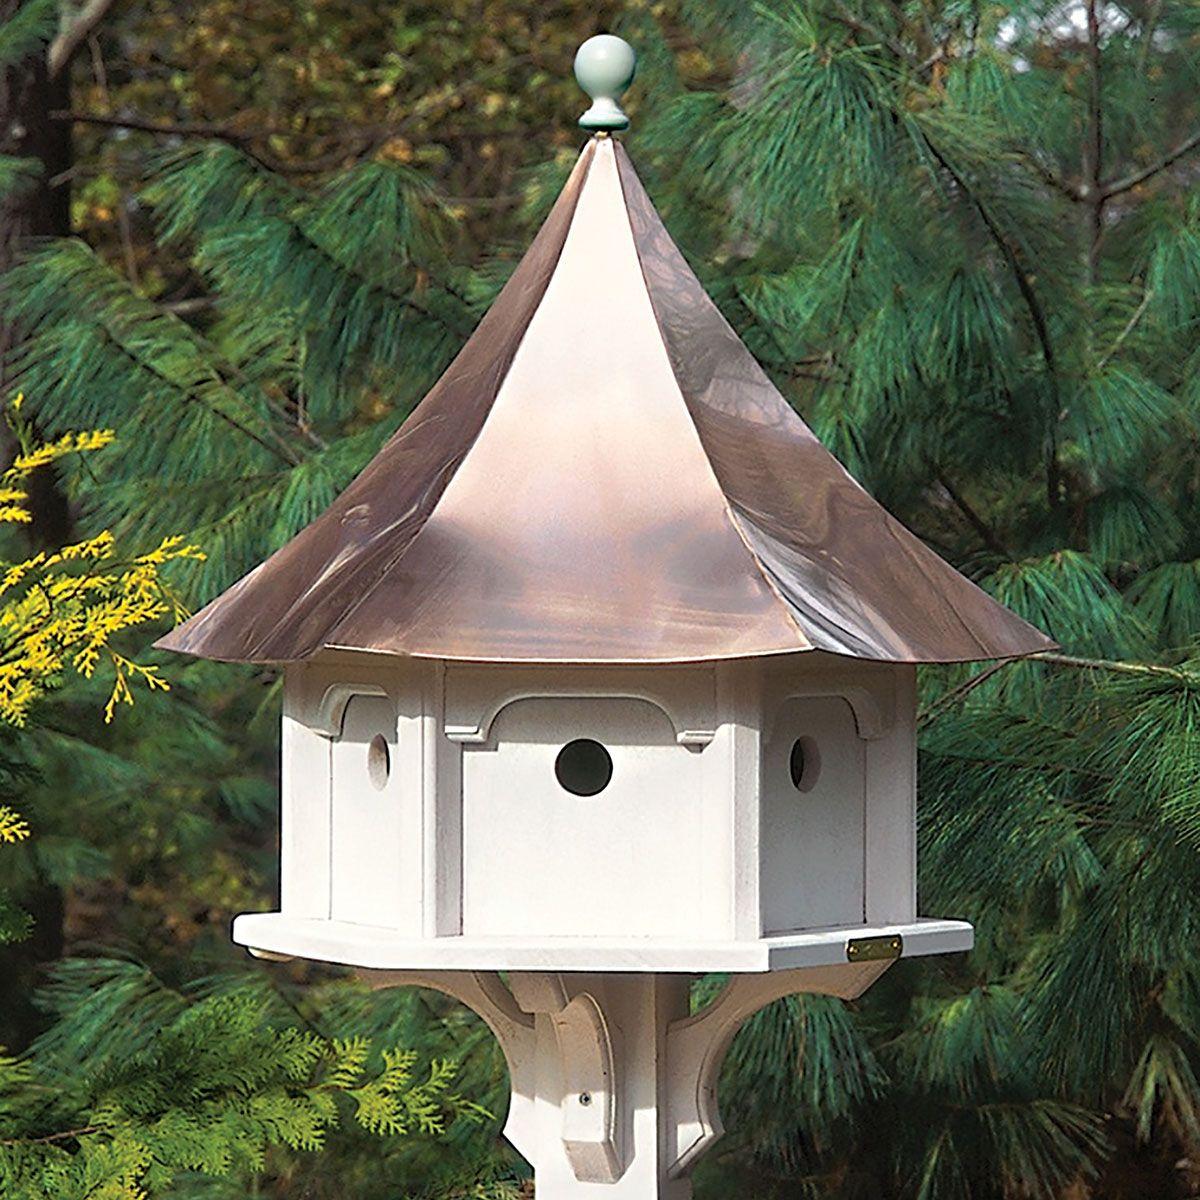 Large Outdoor Bird Houses.Carousel Birdhouse Copper Bird Houses Copper Roof Bird